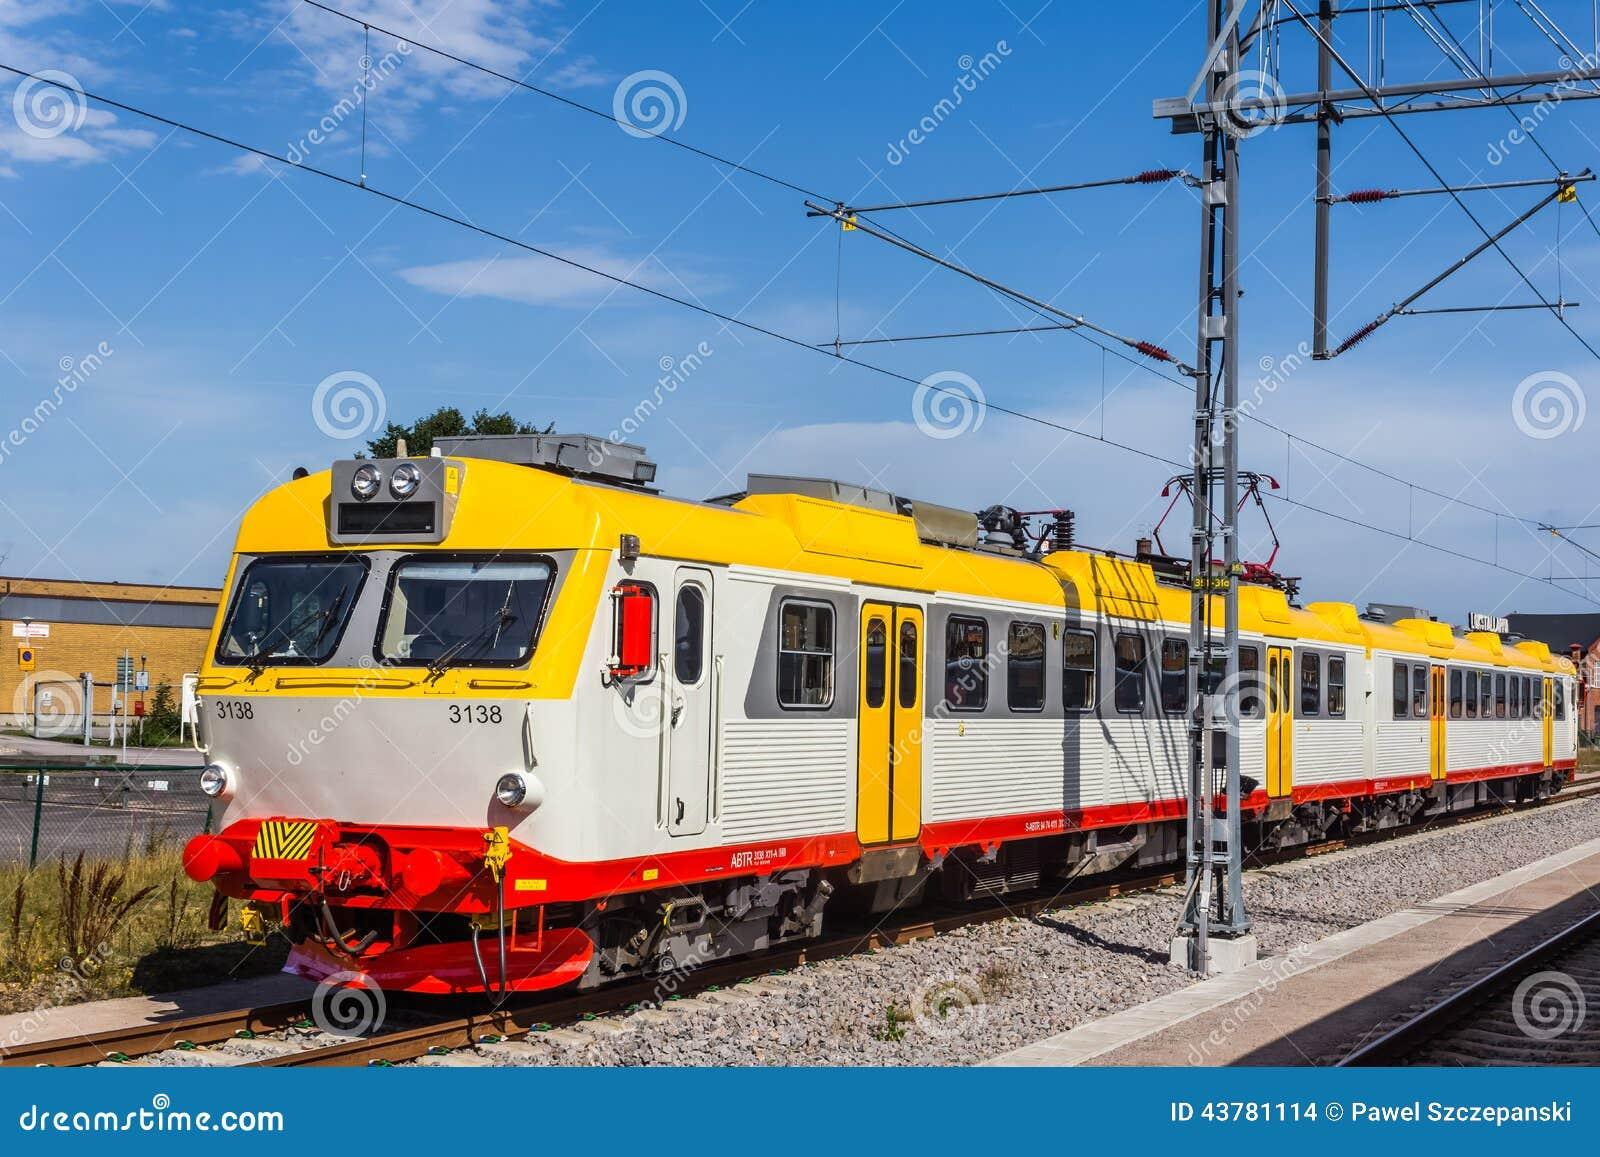 Copenhagen To Gothenburg Train Travel Time